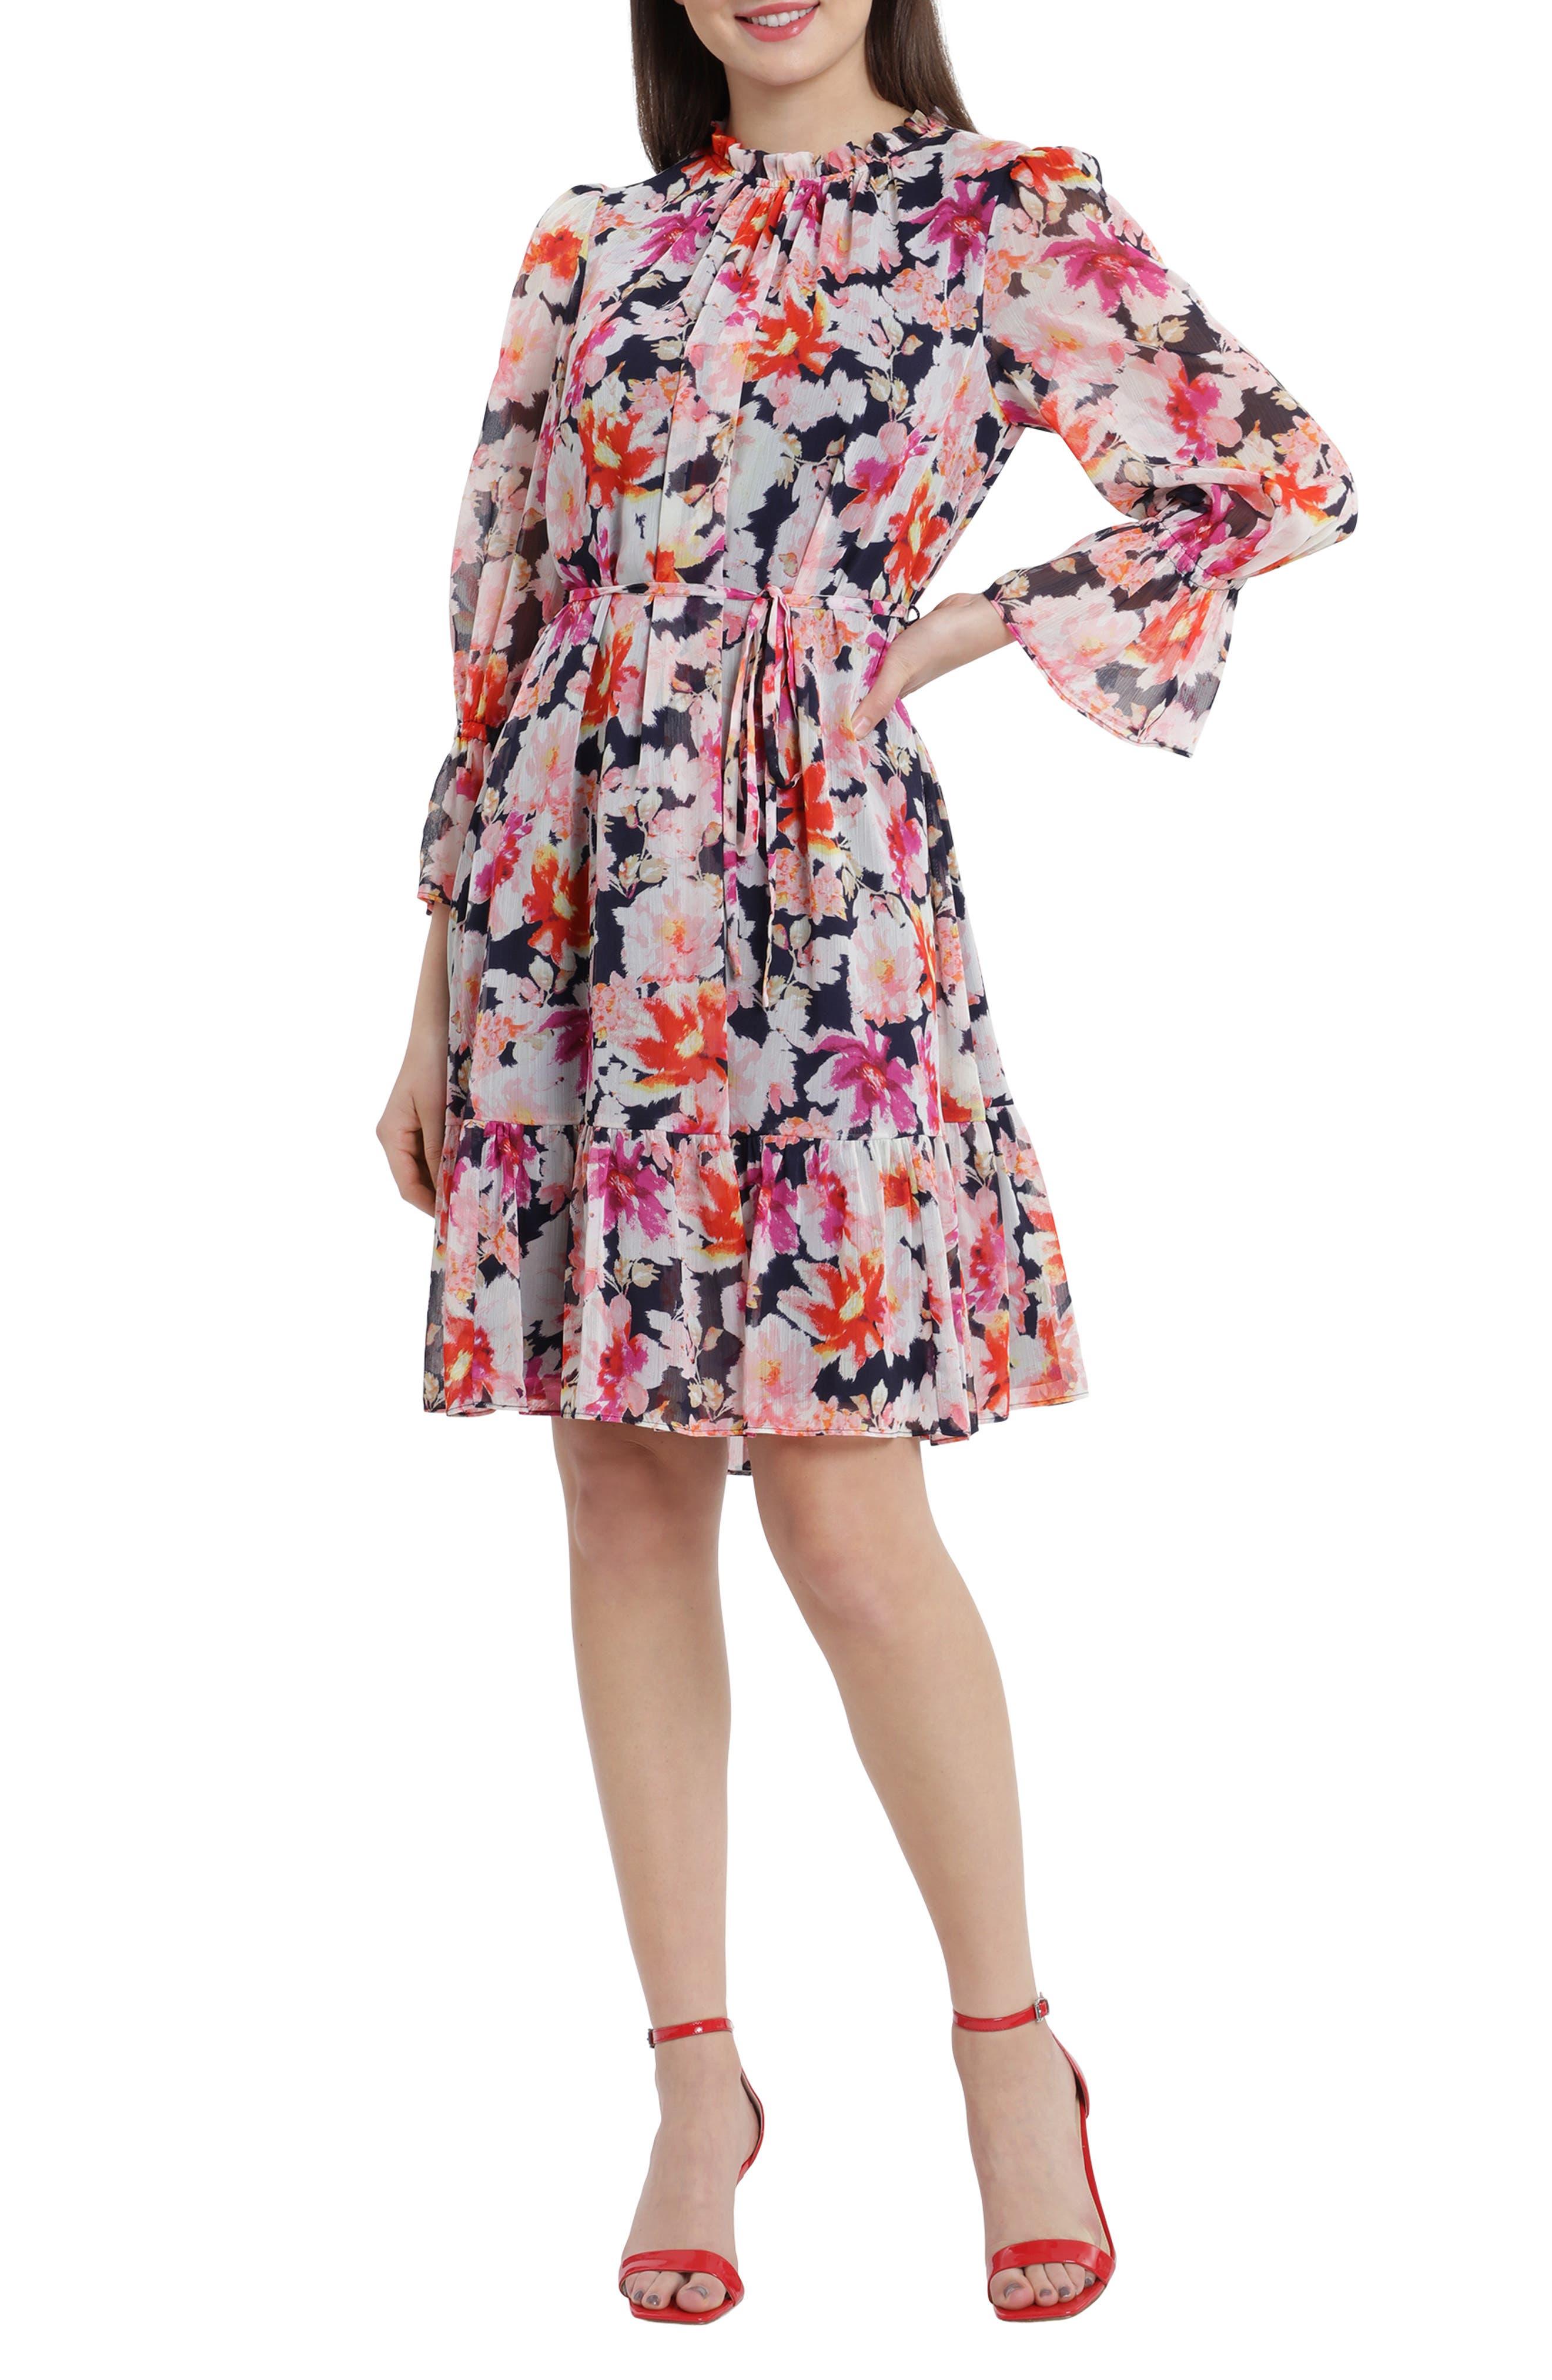 Floral Smocked Ruffle Long Sleeve Chiffon Dress